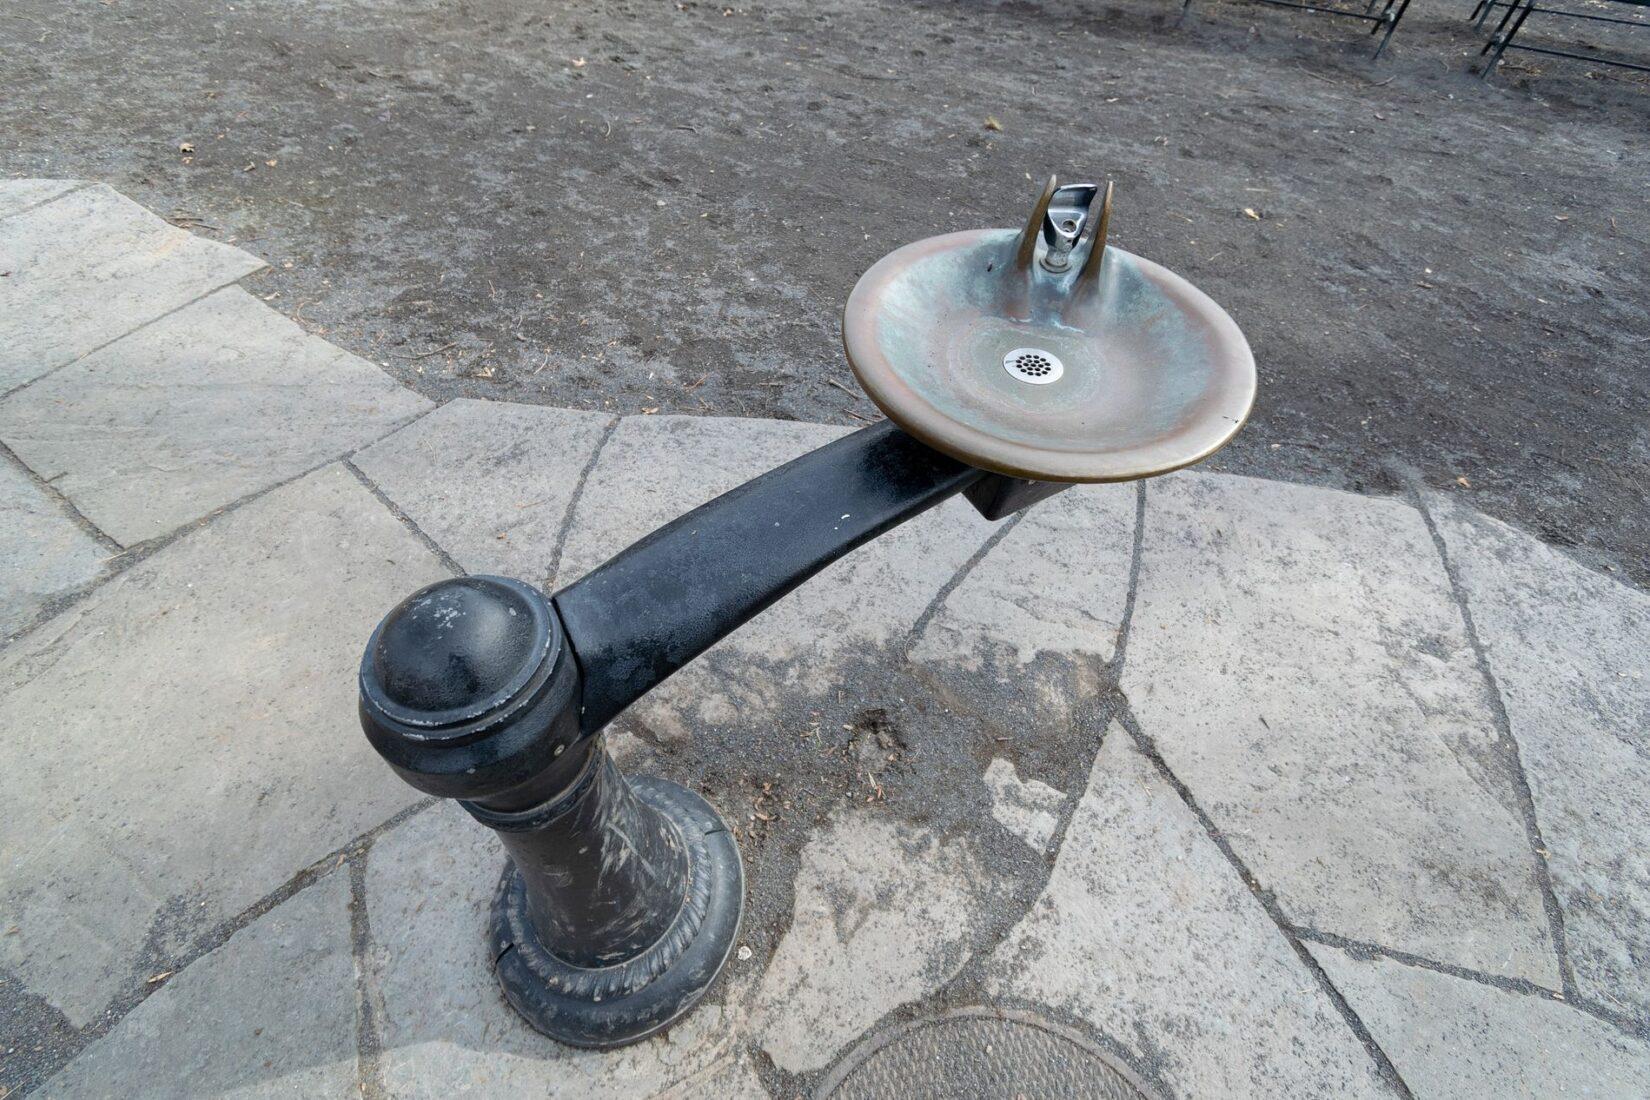 Water Fountain 20190206 0009